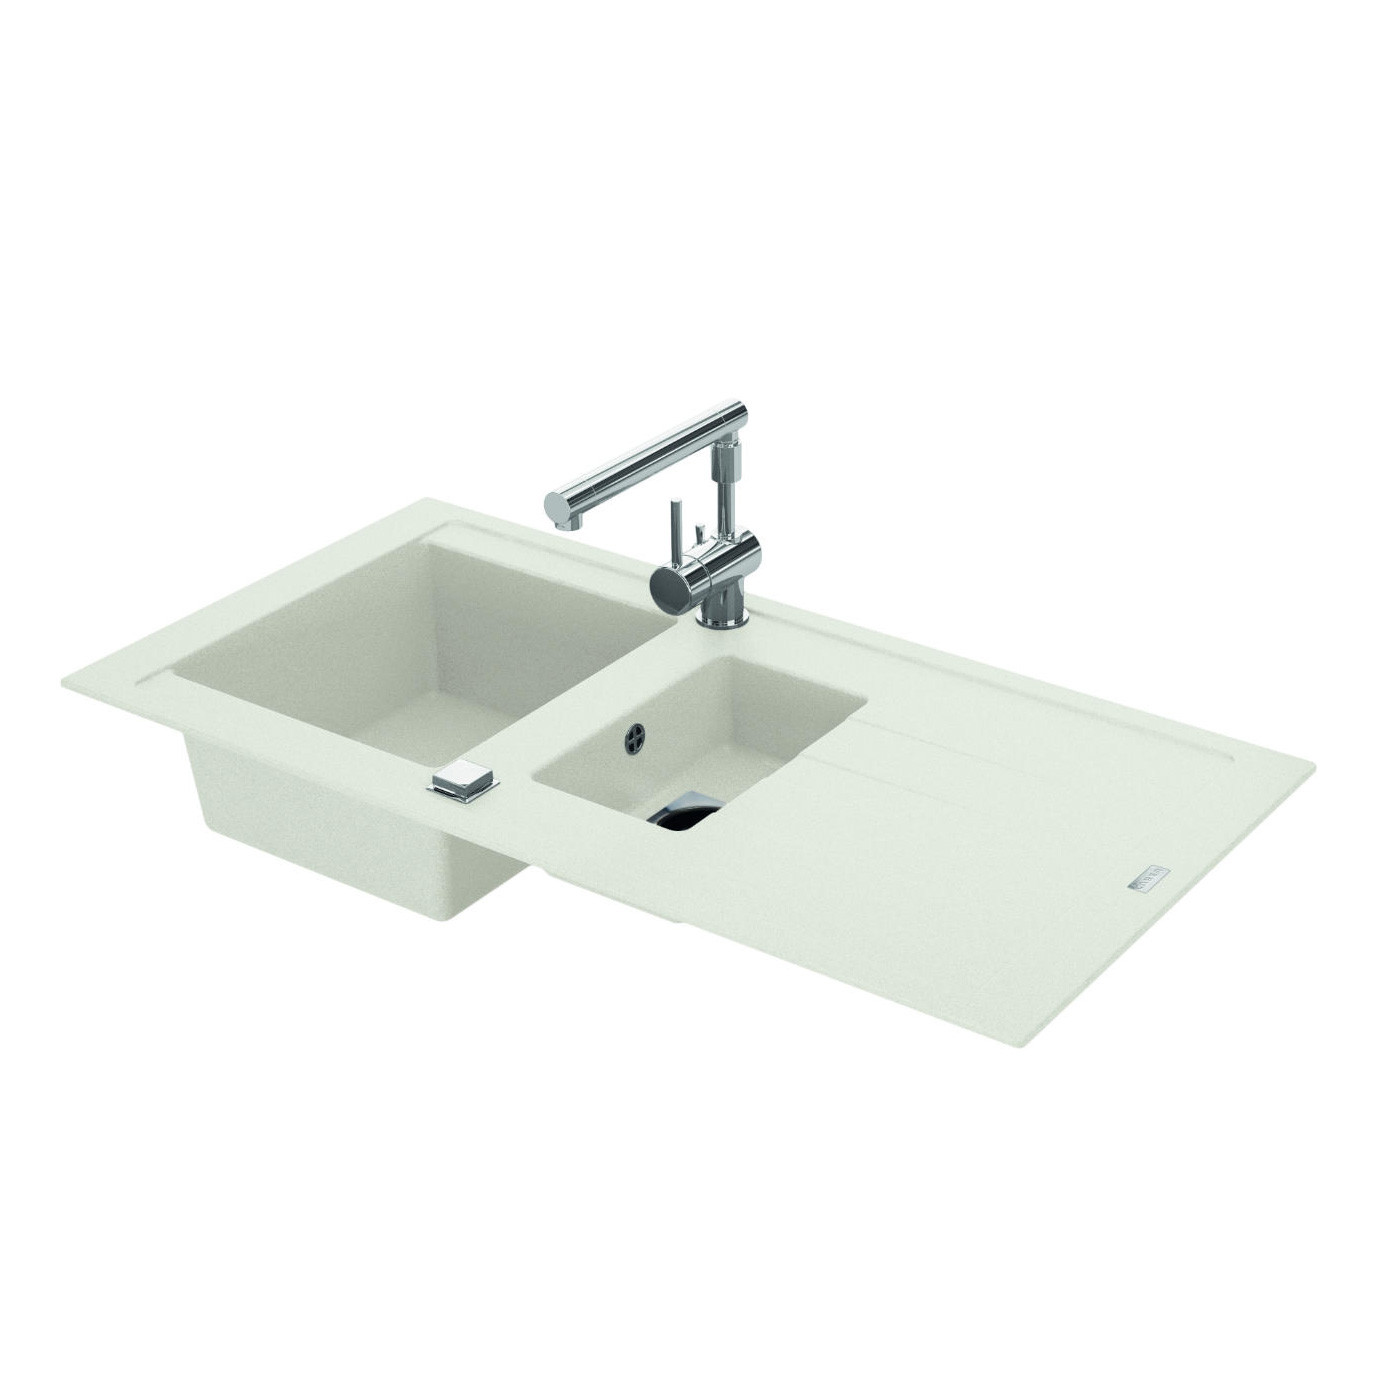 evier encastrer arcos blanc 1 cuve 1 2 anjou connectique. Black Bedroom Furniture Sets. Home Design Ideas